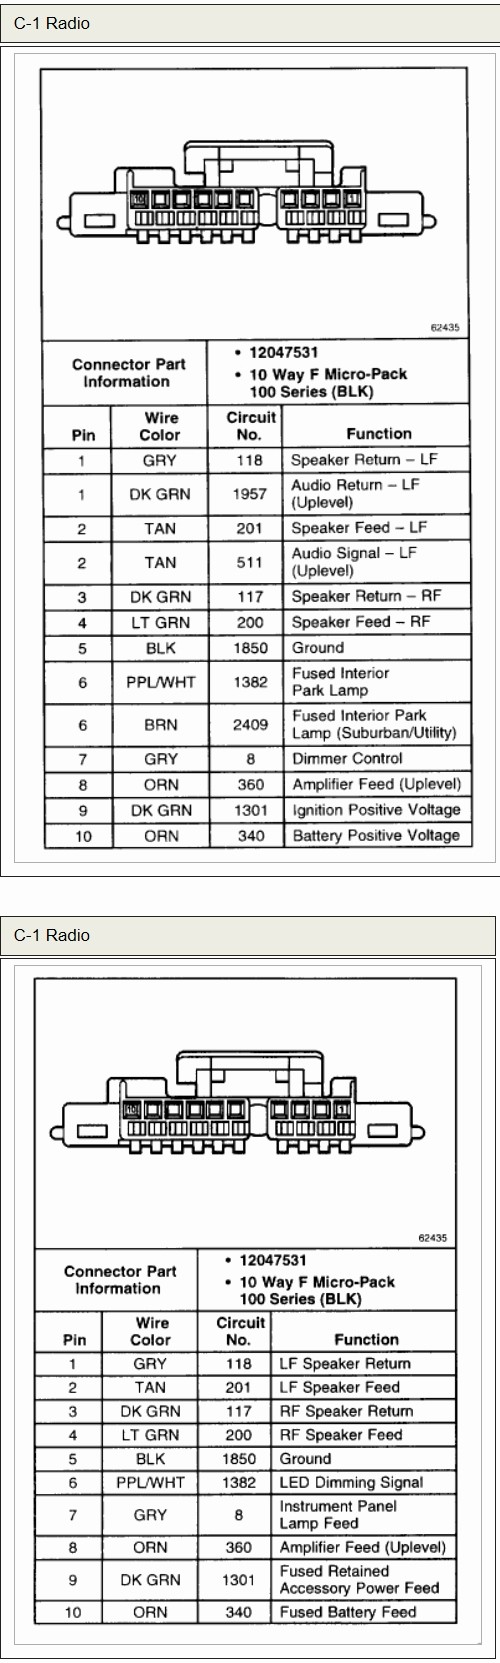 2001 chevy s10 radio wiring diagram - wiring diagram tags dear-base -  dear-base.discoveriran.it  discoveriran.it